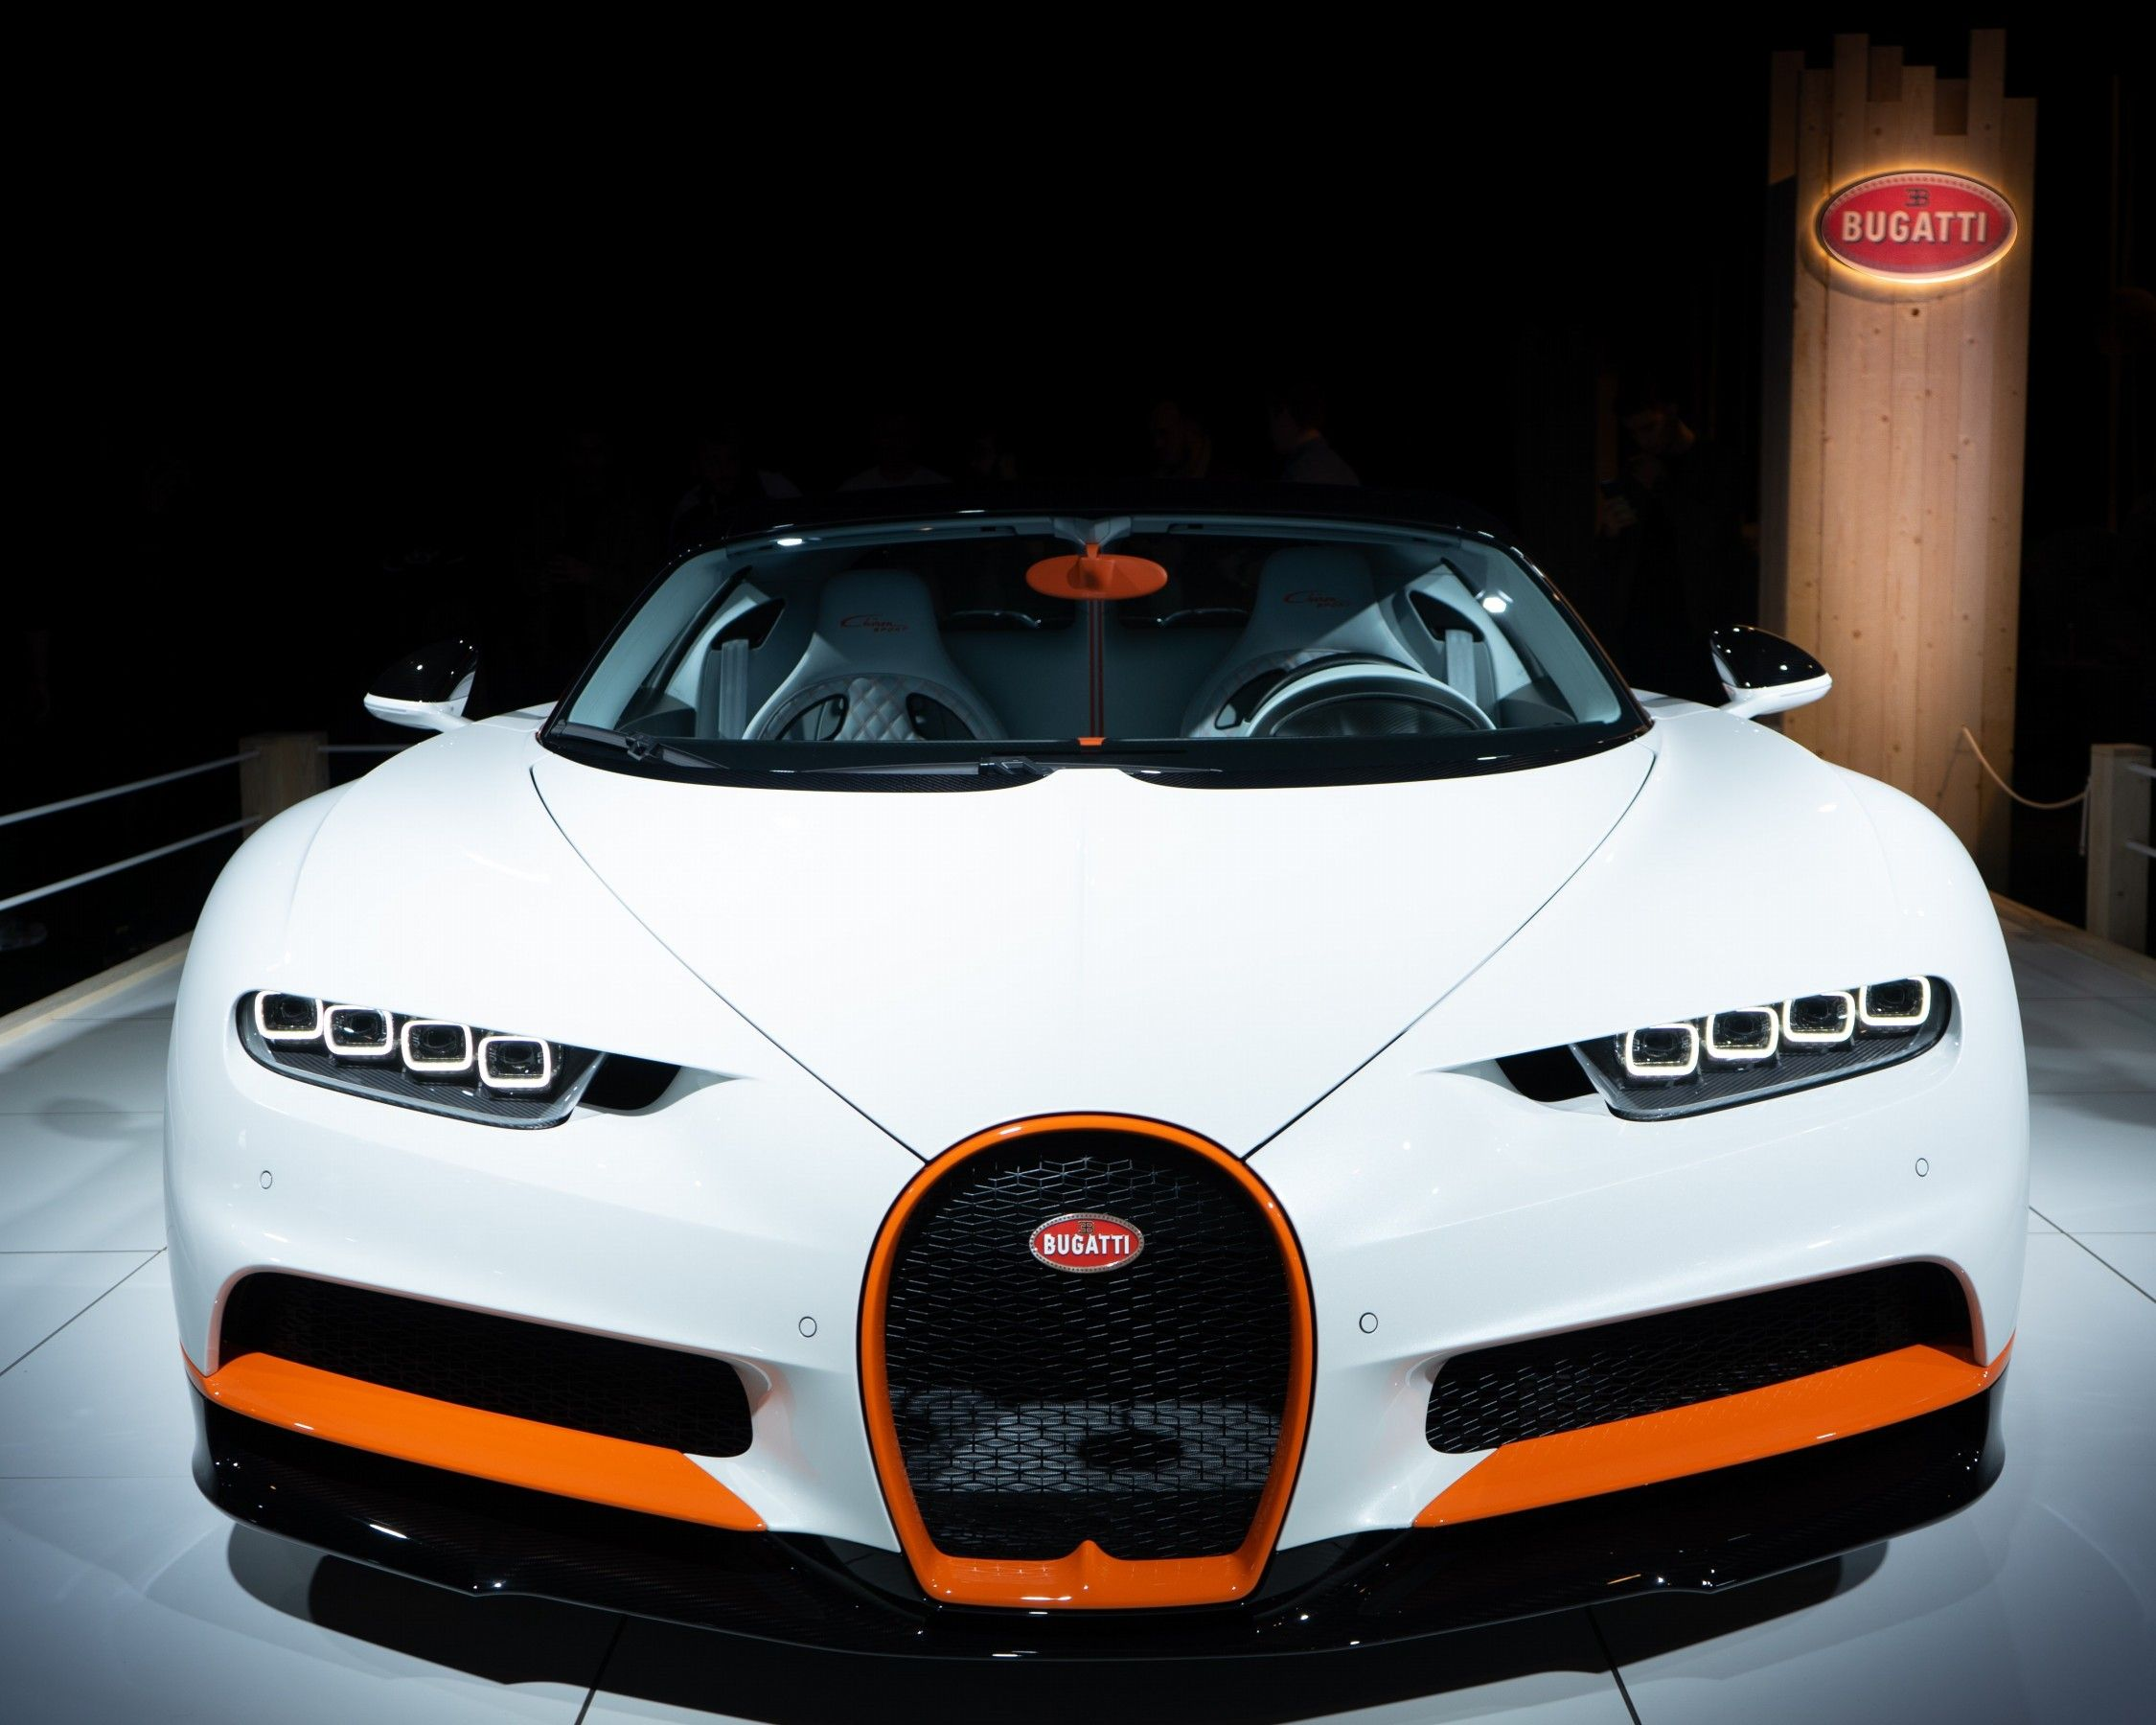 Price Of Bugatti In Nigeria Bugatti Bugatti Veyron Bugatti Cars